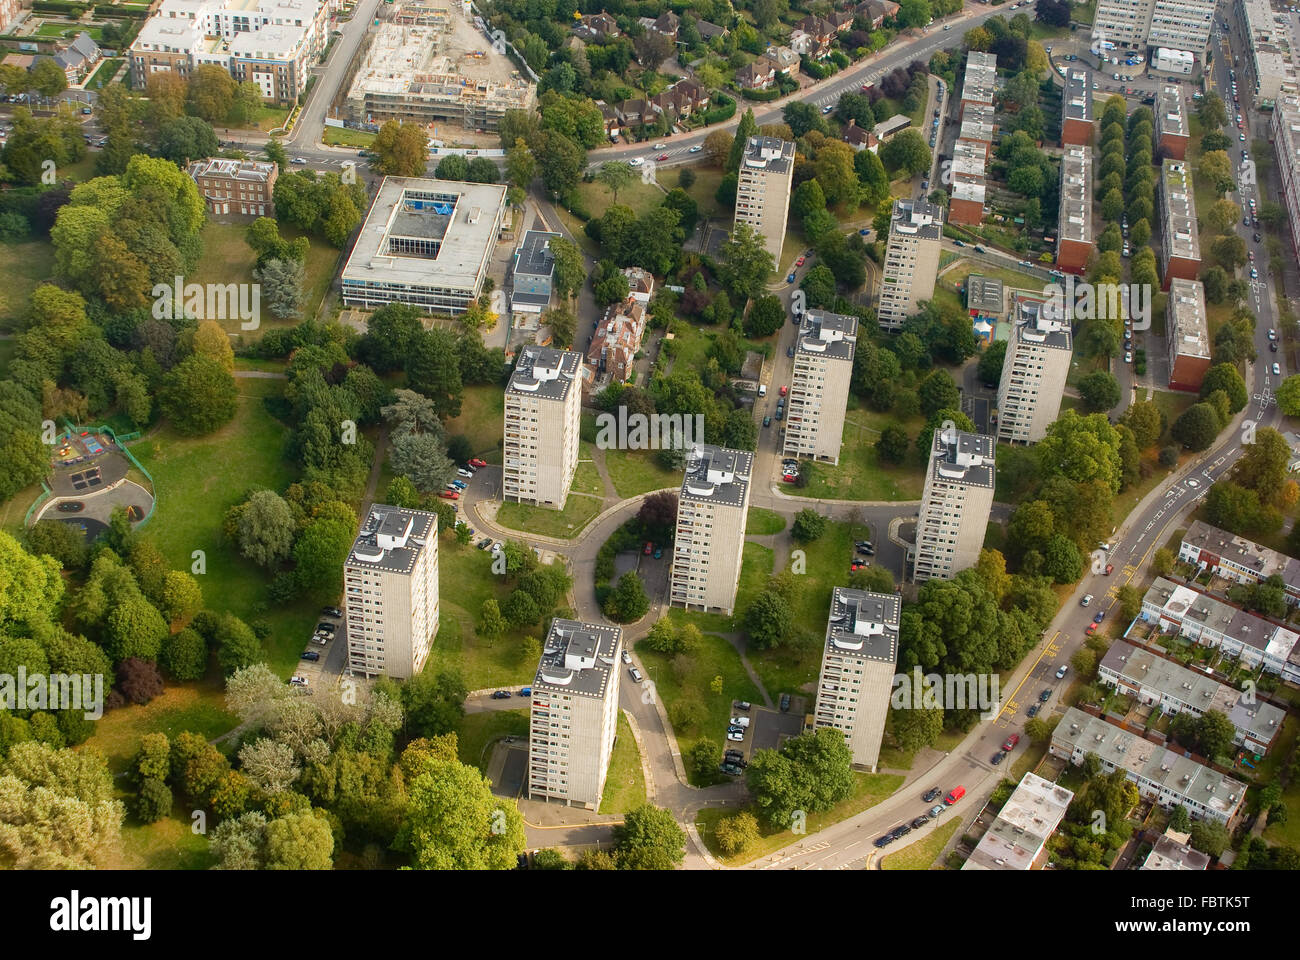 Multistory buildings near London - Stock Image